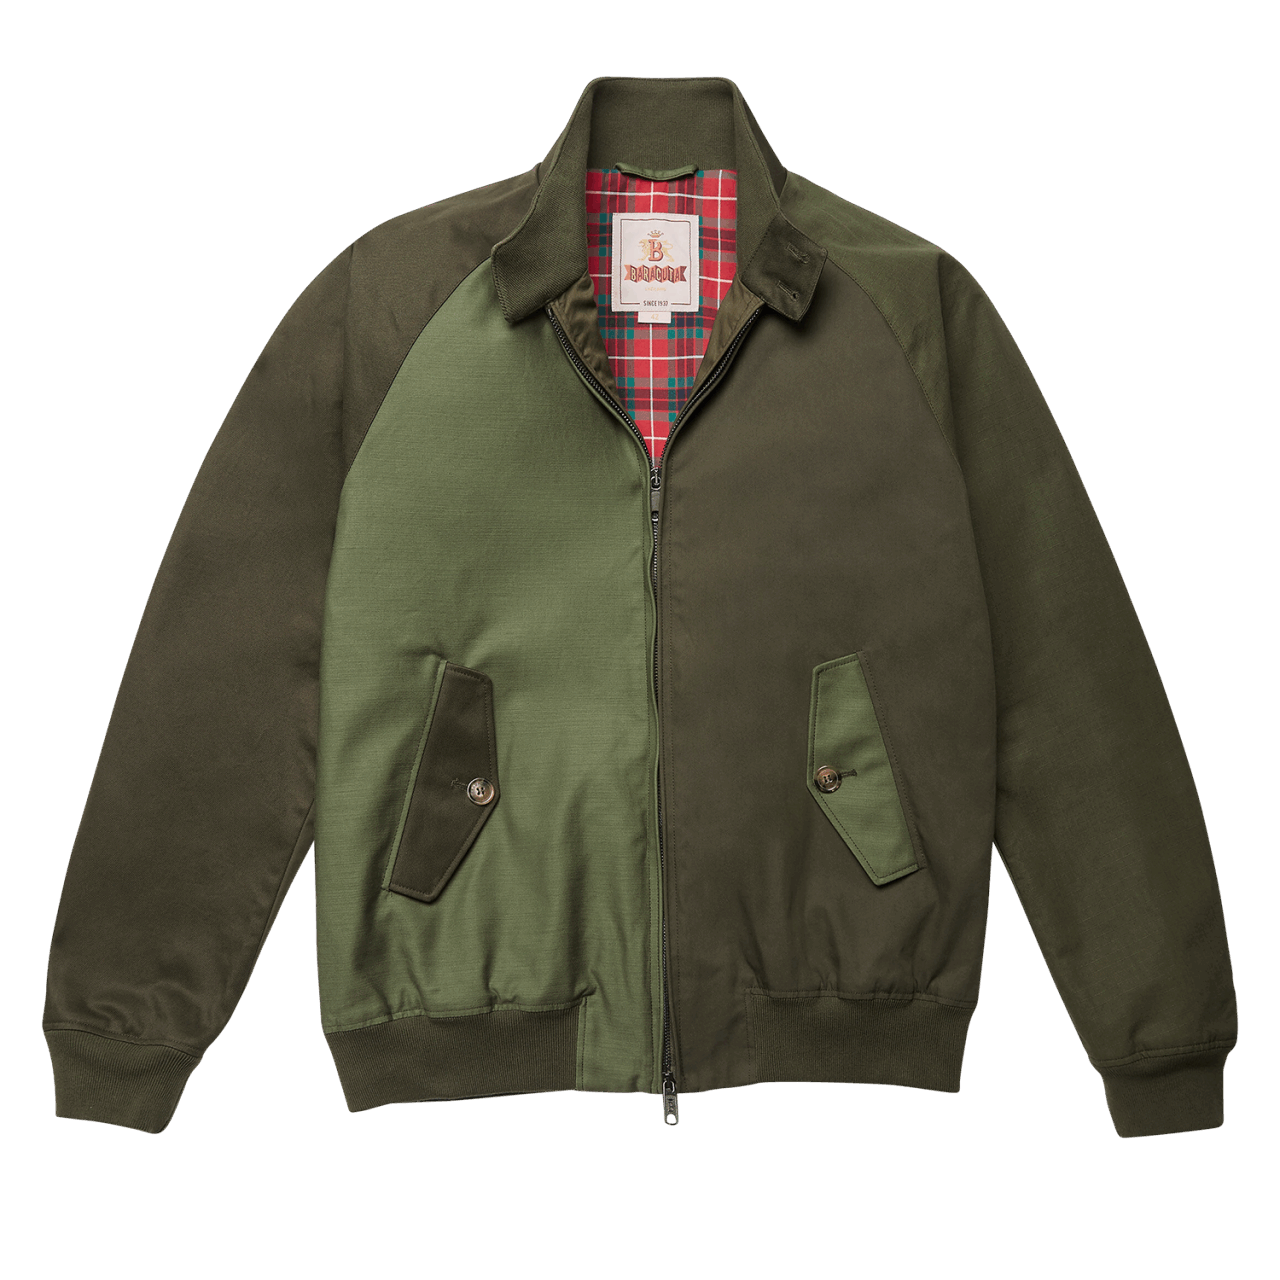 Baracuta G9 Jacket - Patchwork Olive